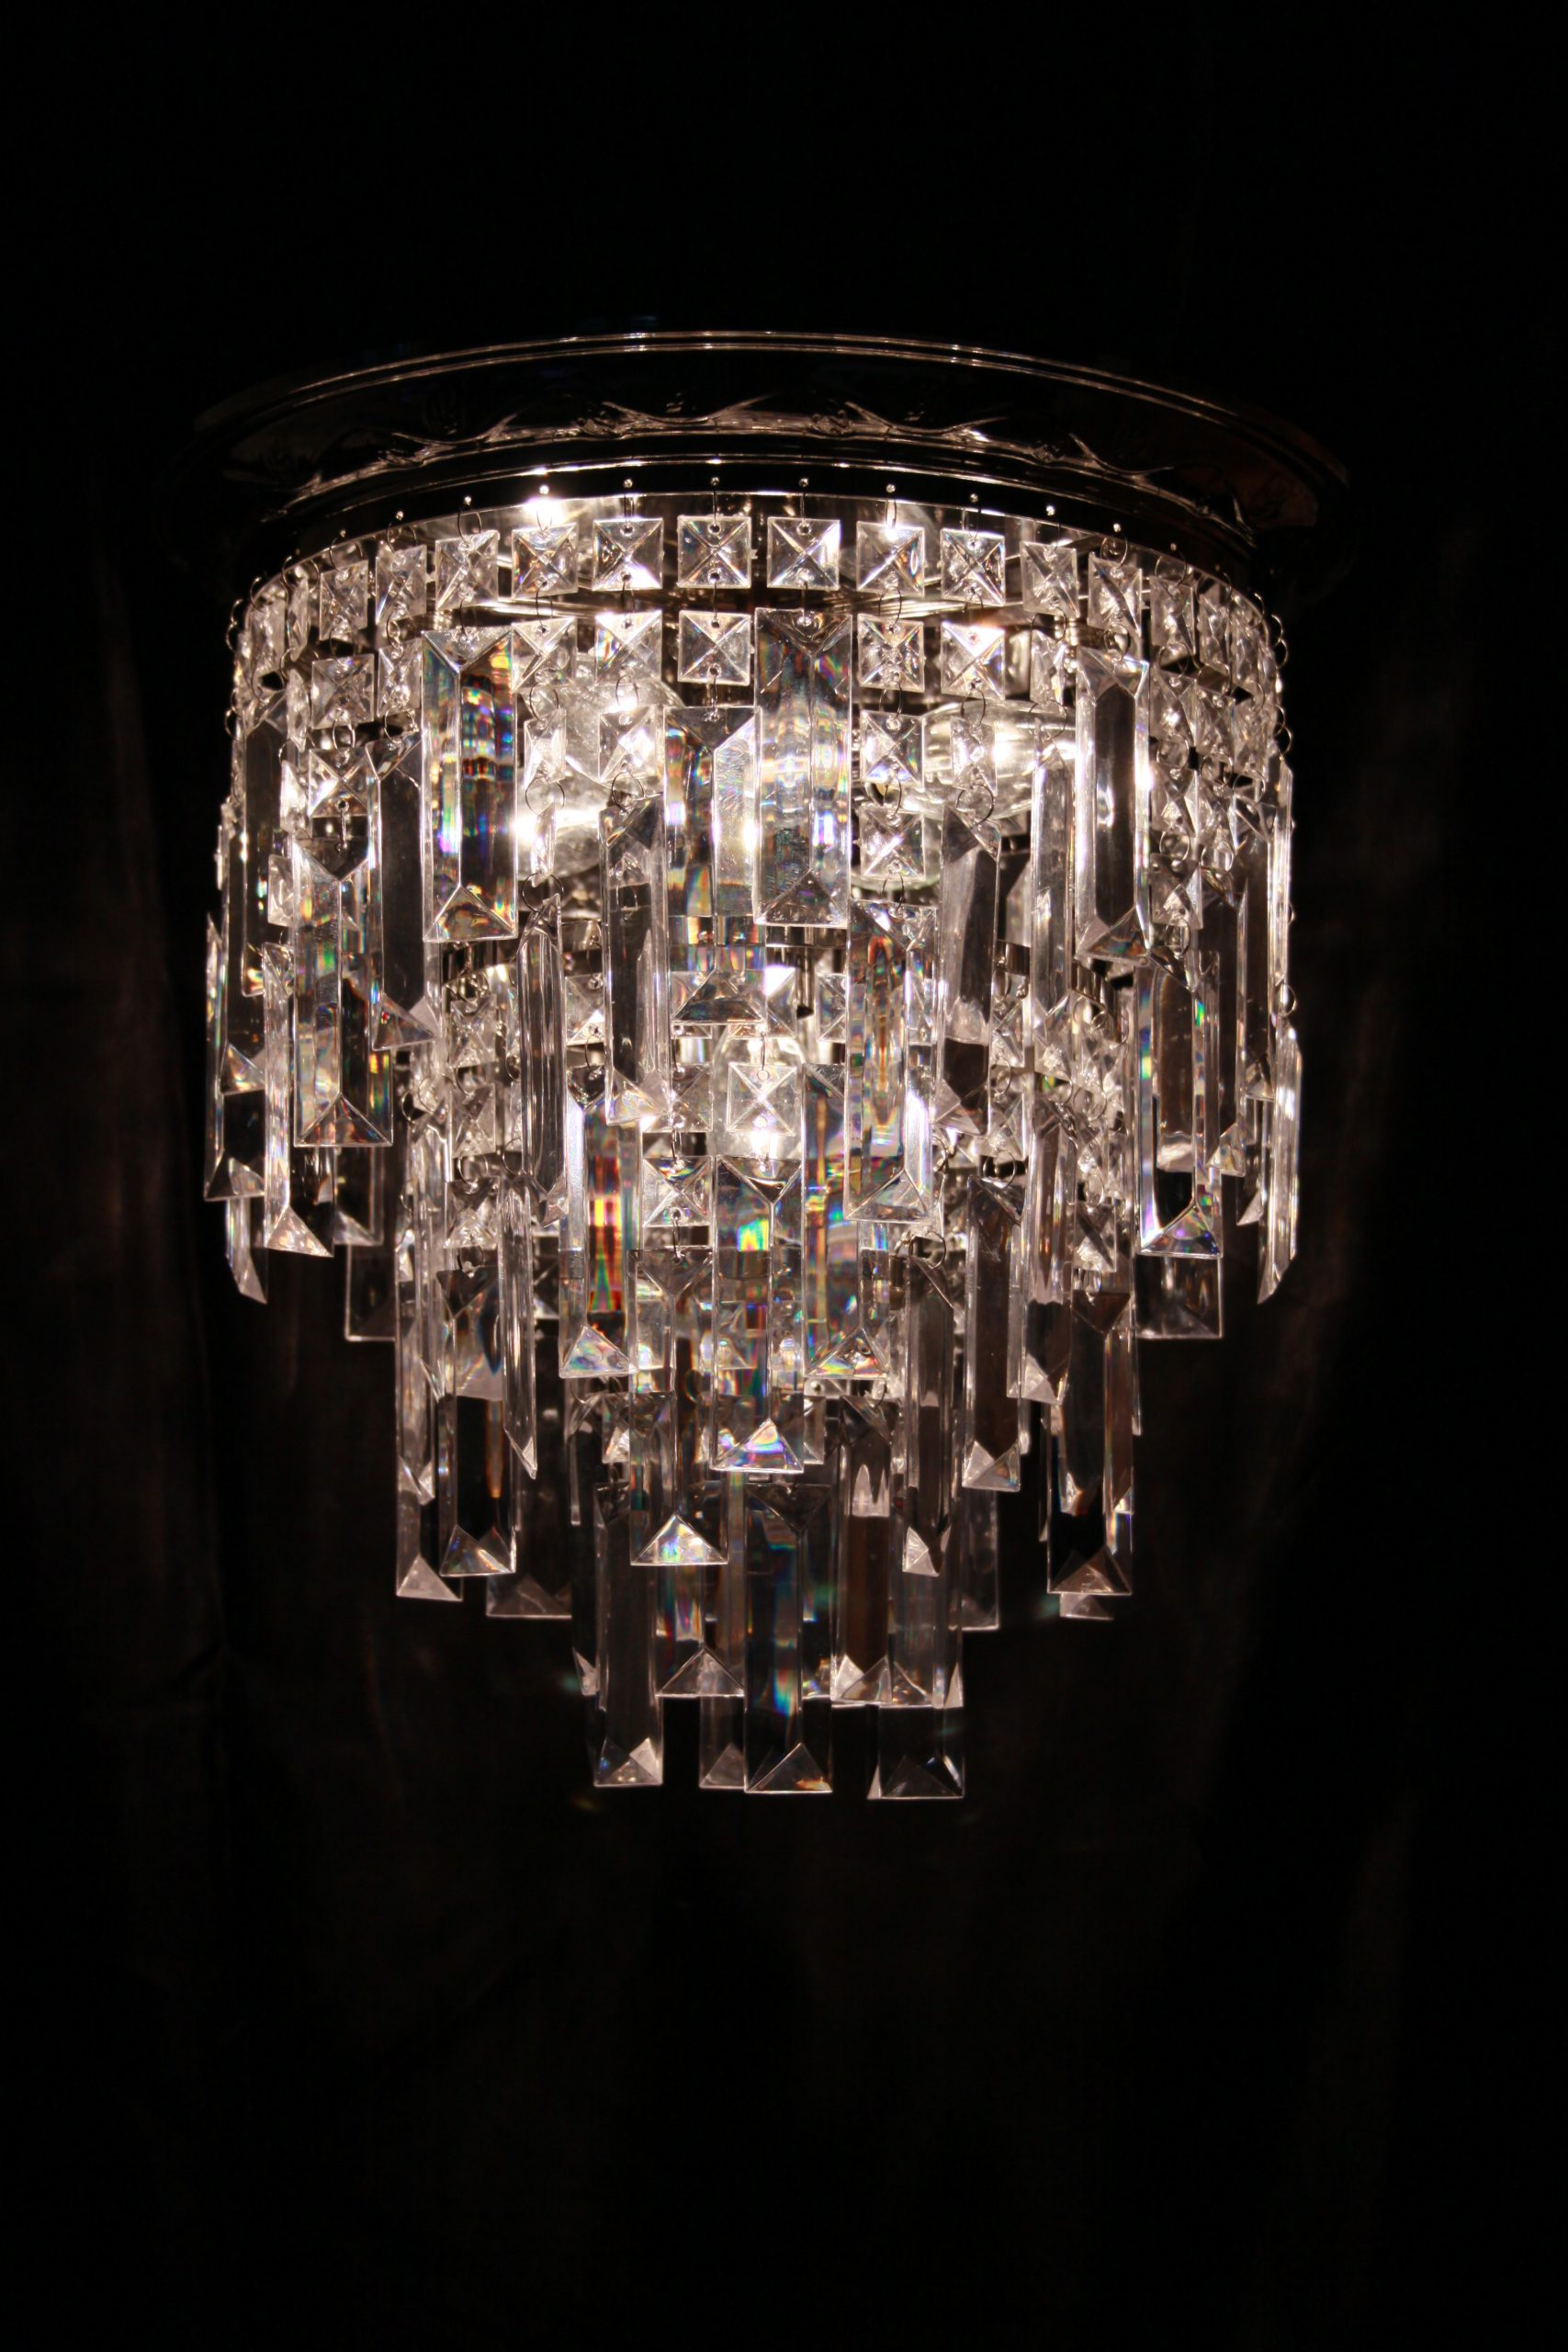 Medium chandelier